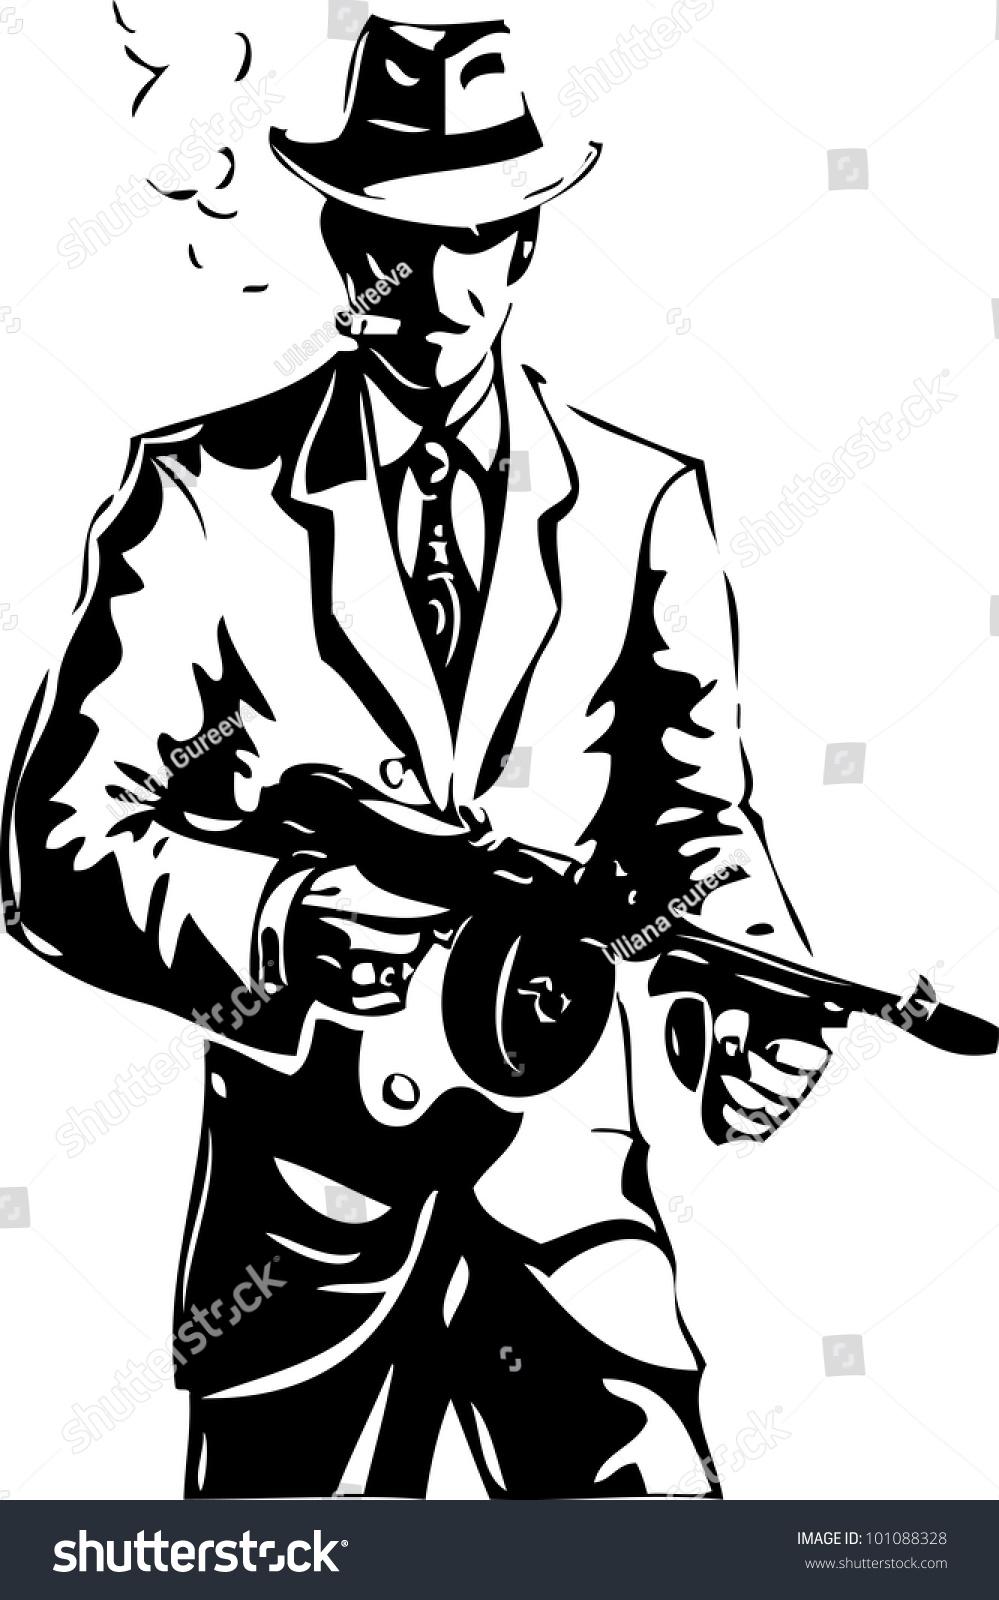 Drawing Gangster Mafia Stock Vector 101088328 Shutterstock